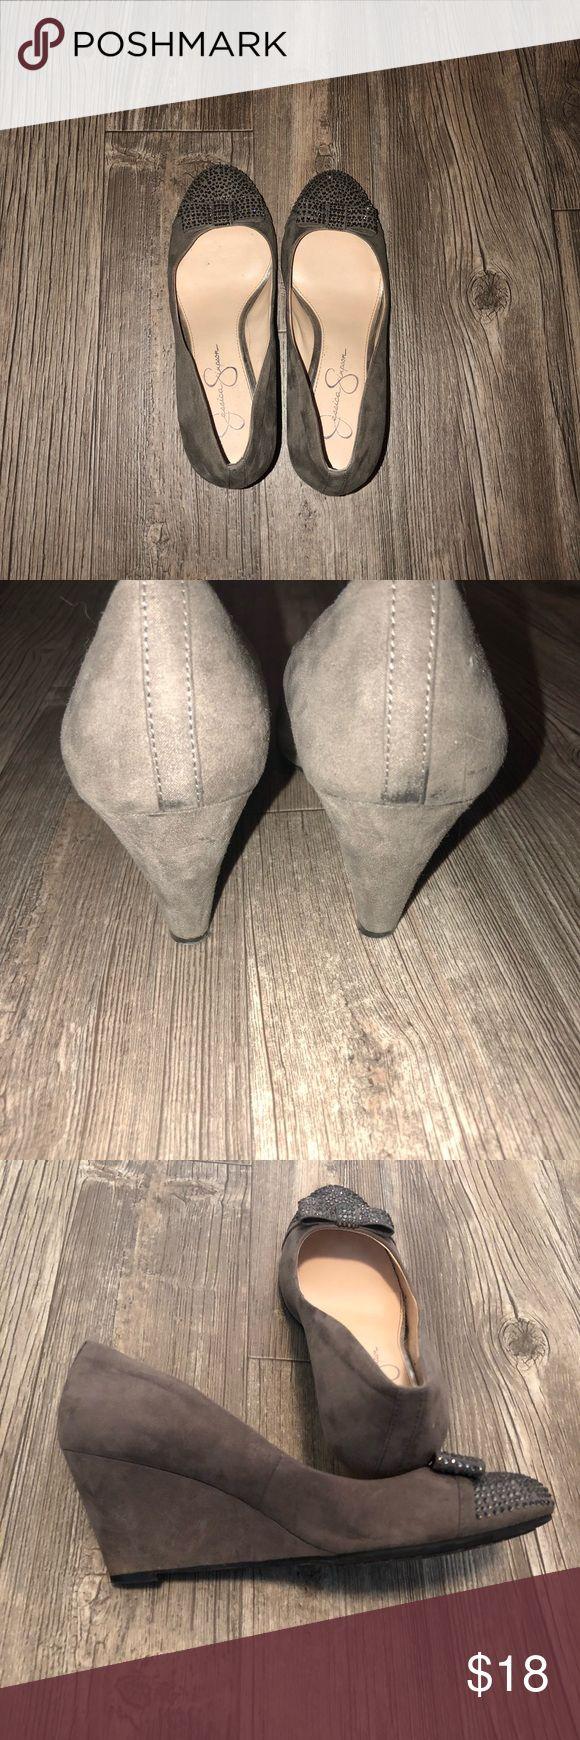 Gray wedges with rhinestones Jessica Simpson Gary wedges with rhinestones Jessica Simpson Shoes Wedges